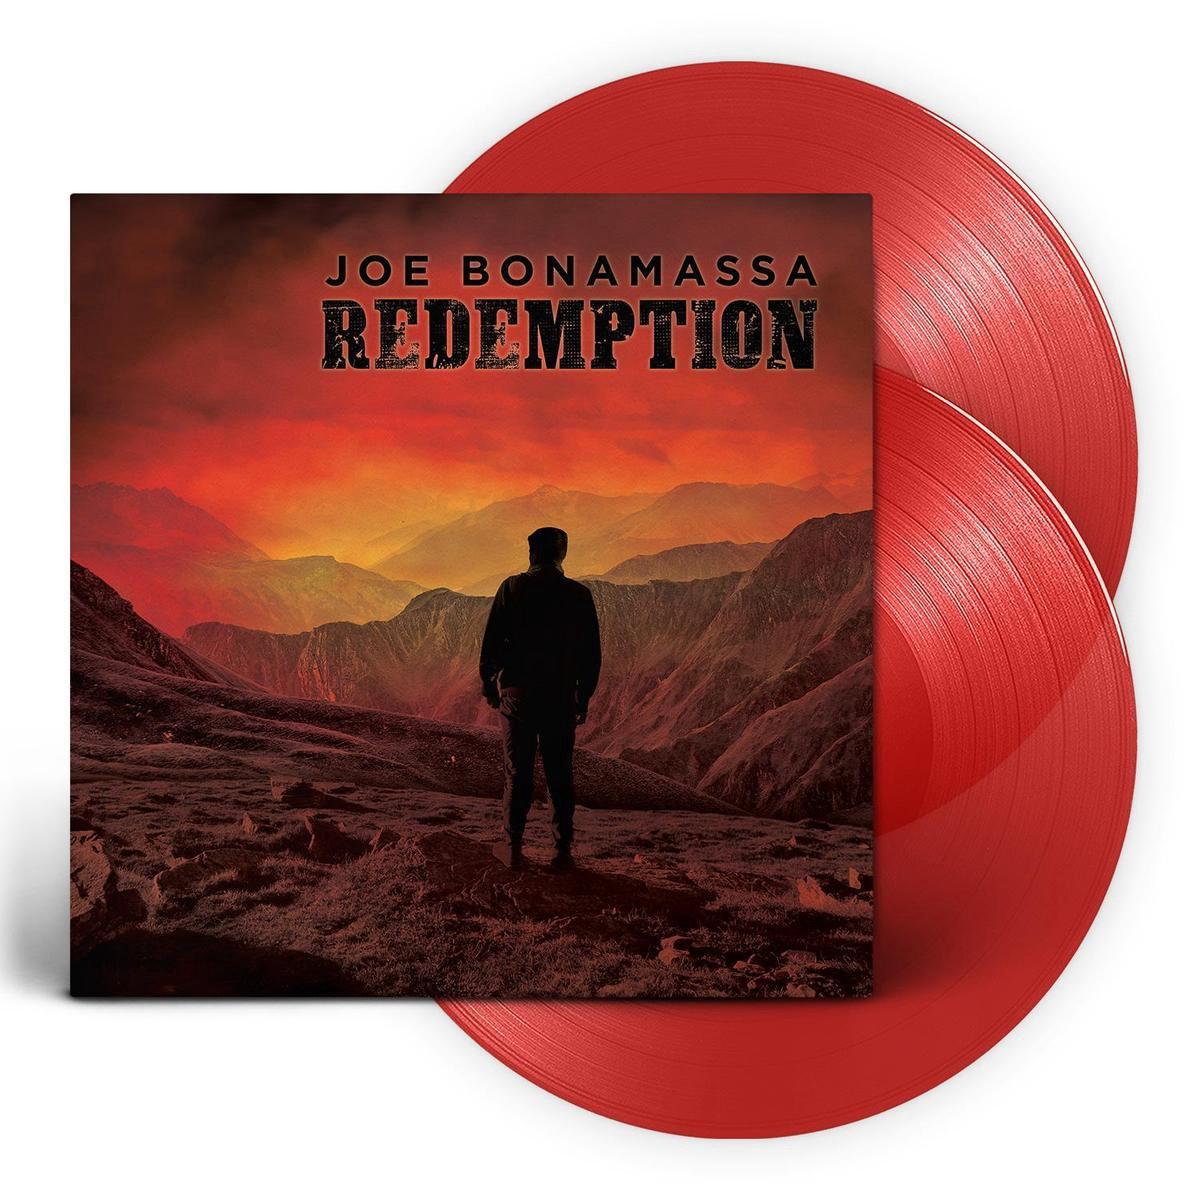 Redemption (Limited Coloured Vinyl) (LP) - Joe Bonamassa